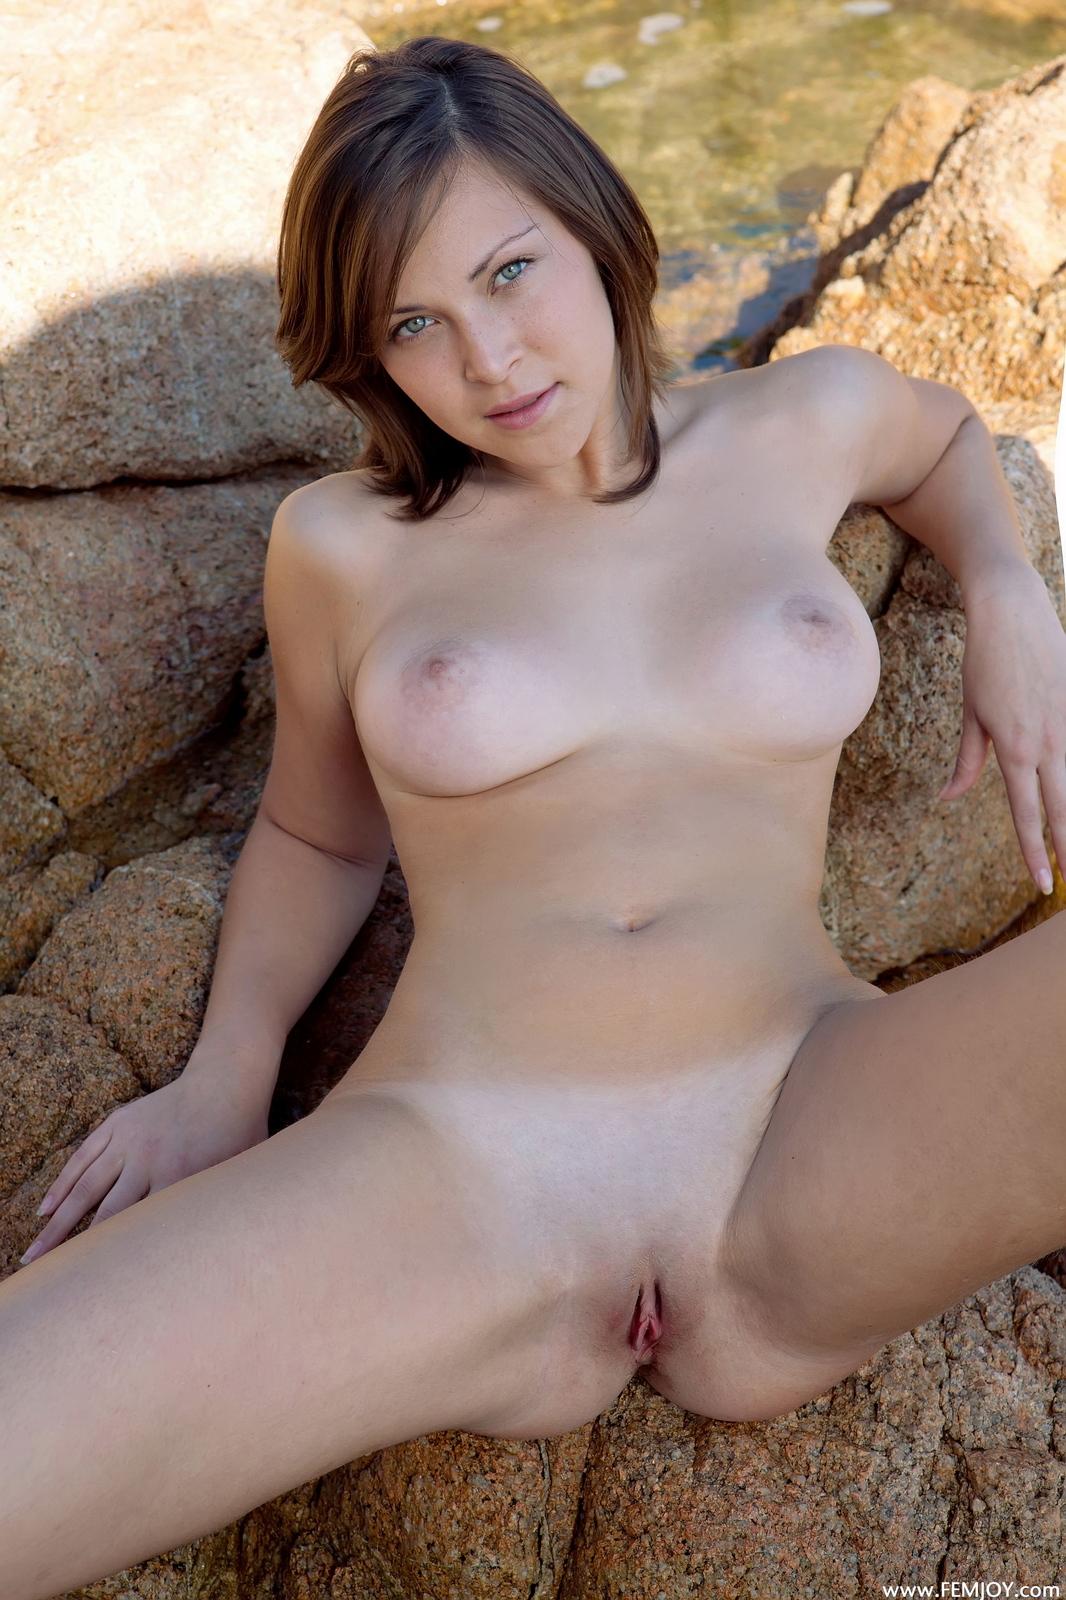 sophia-h-seaside-naked-boobs-rocks-femjoy-37